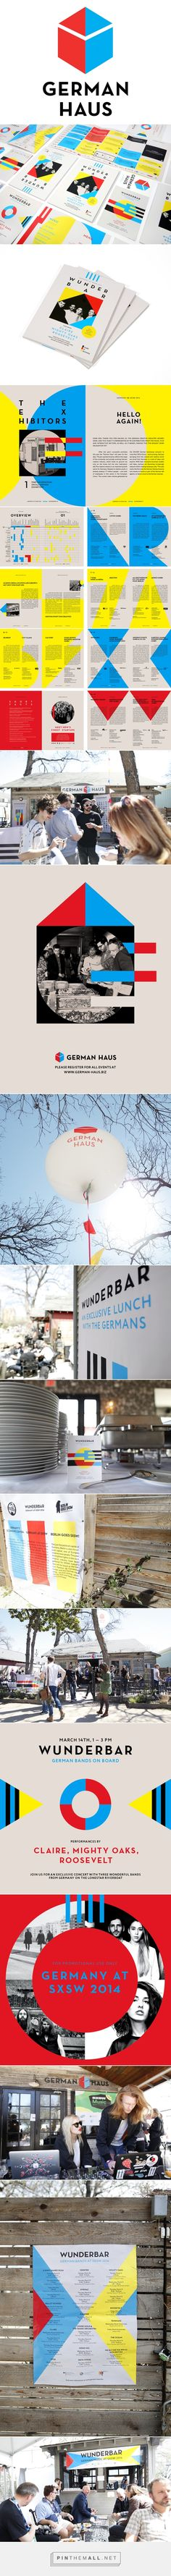 SXSW 2014. German Haus. on Behance - created via http://pinthemall.net